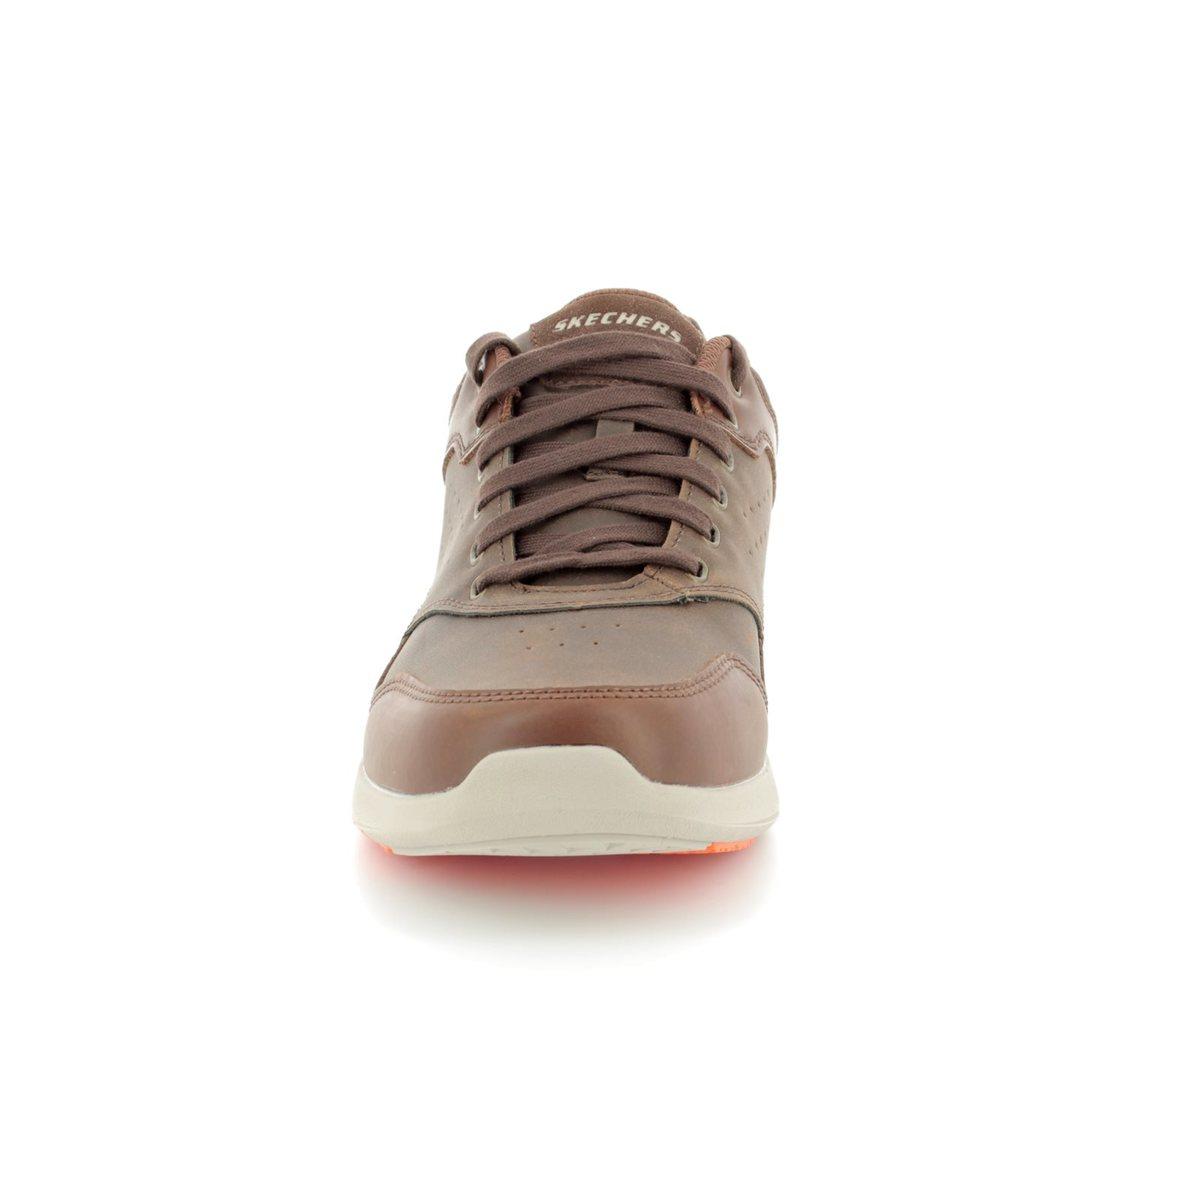 33c2eb72b5da Skechers Elent Velago 65406 BRN Brown casual shoes